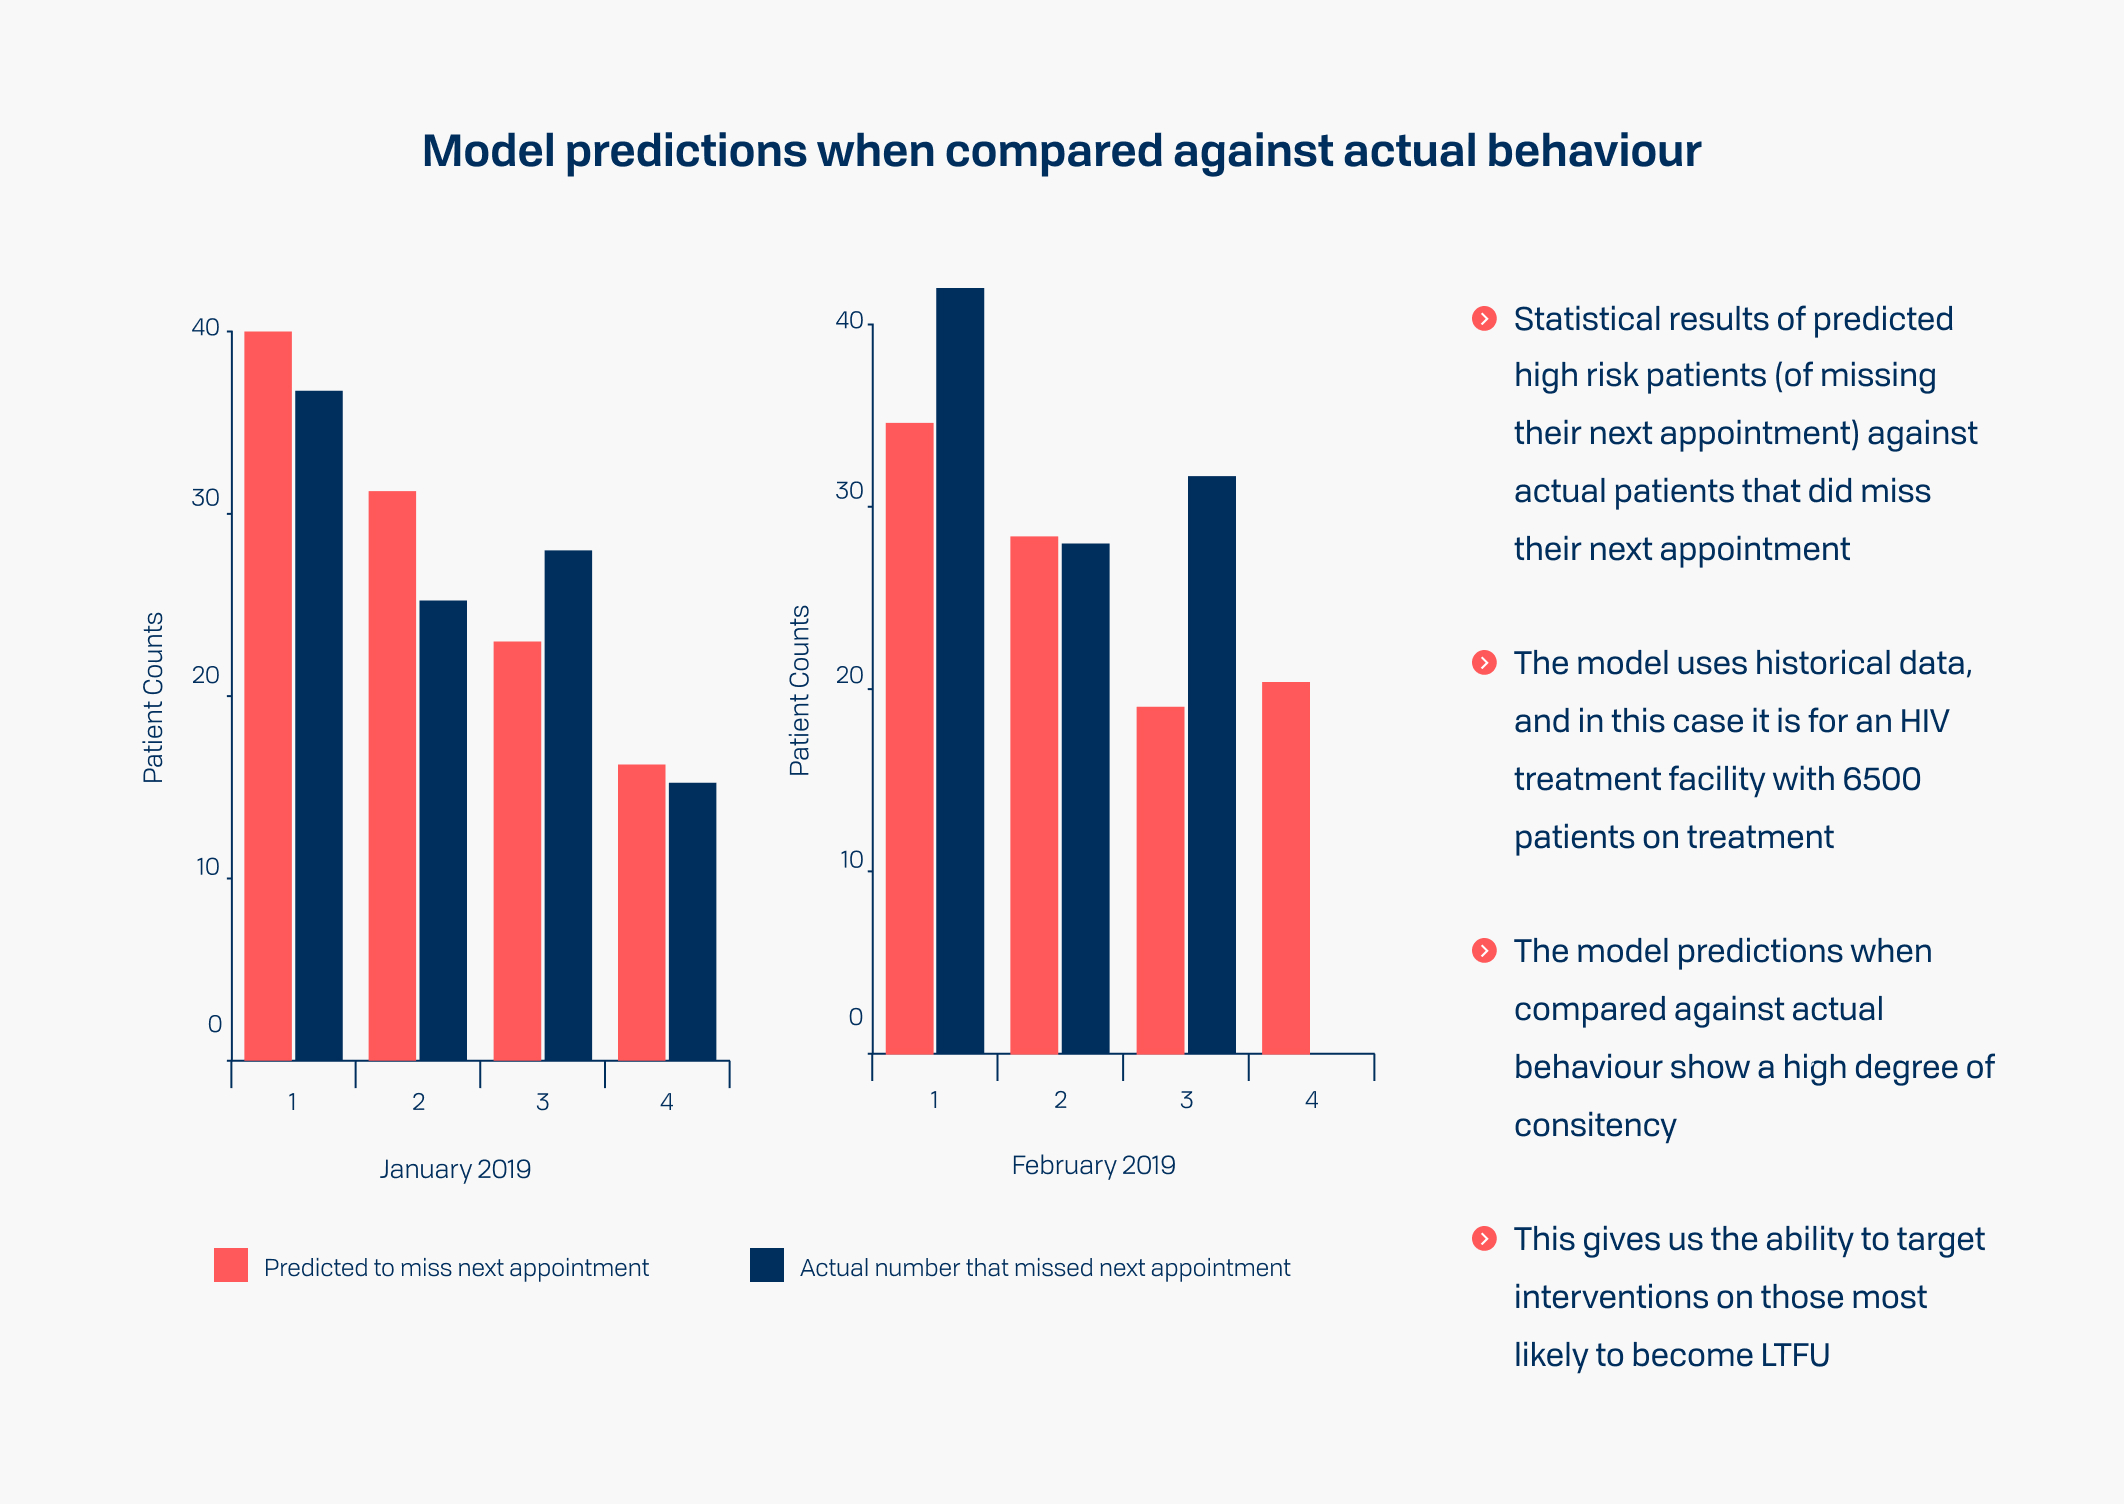 Model predictions when compared to actual behaviour